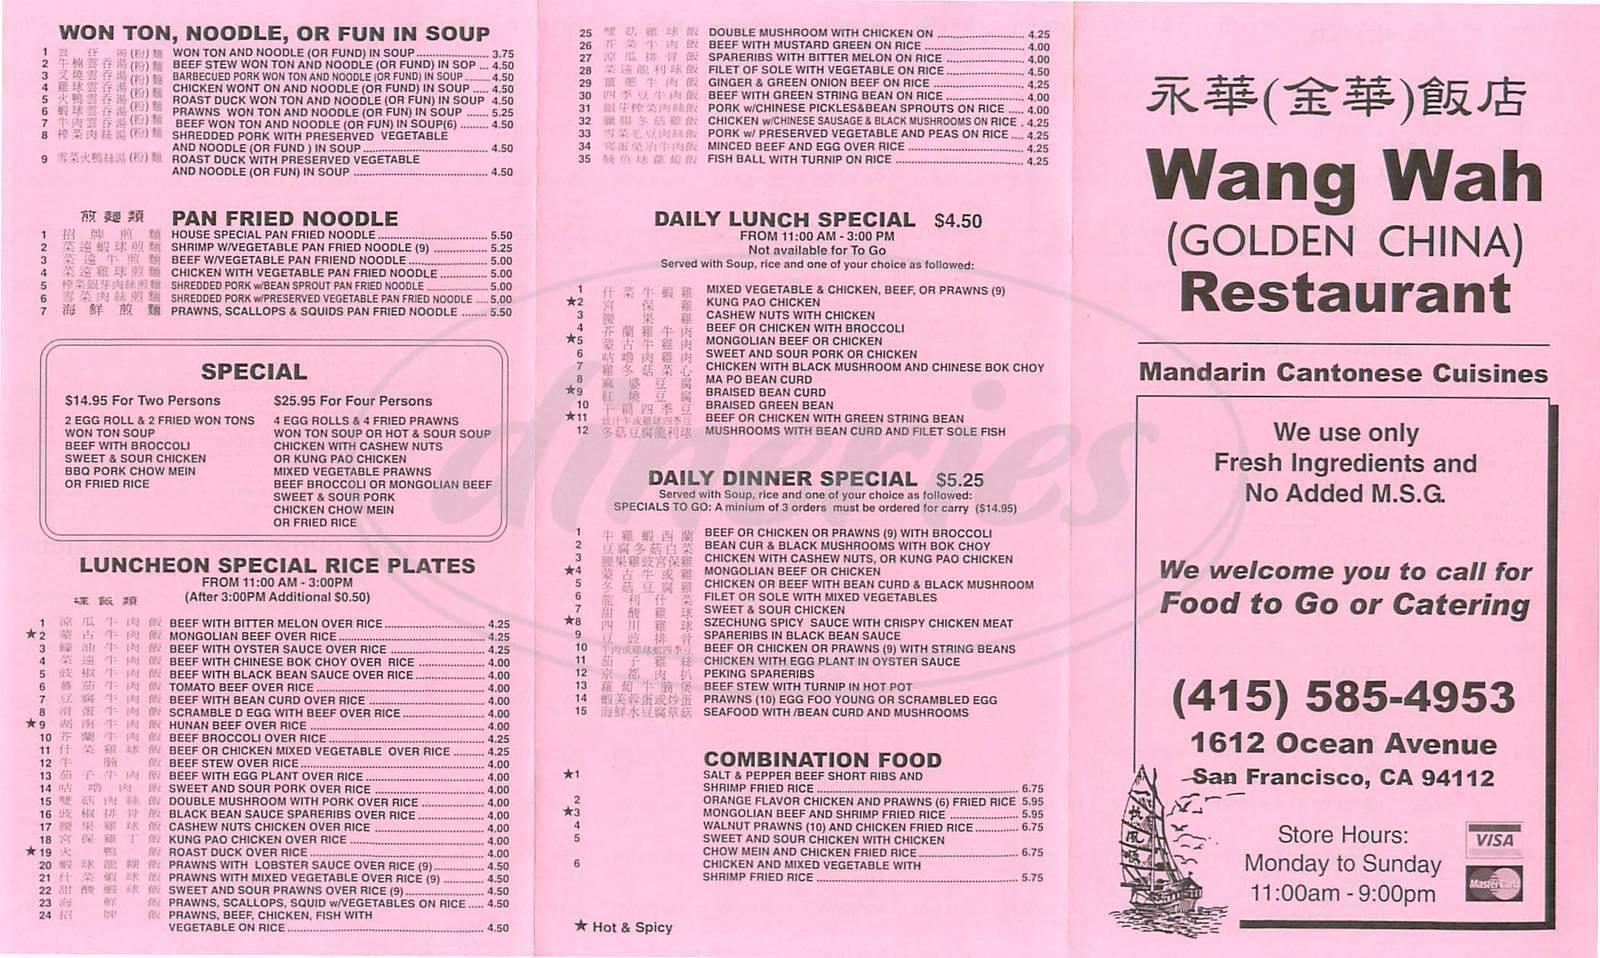 menu for Golden China Restaurant